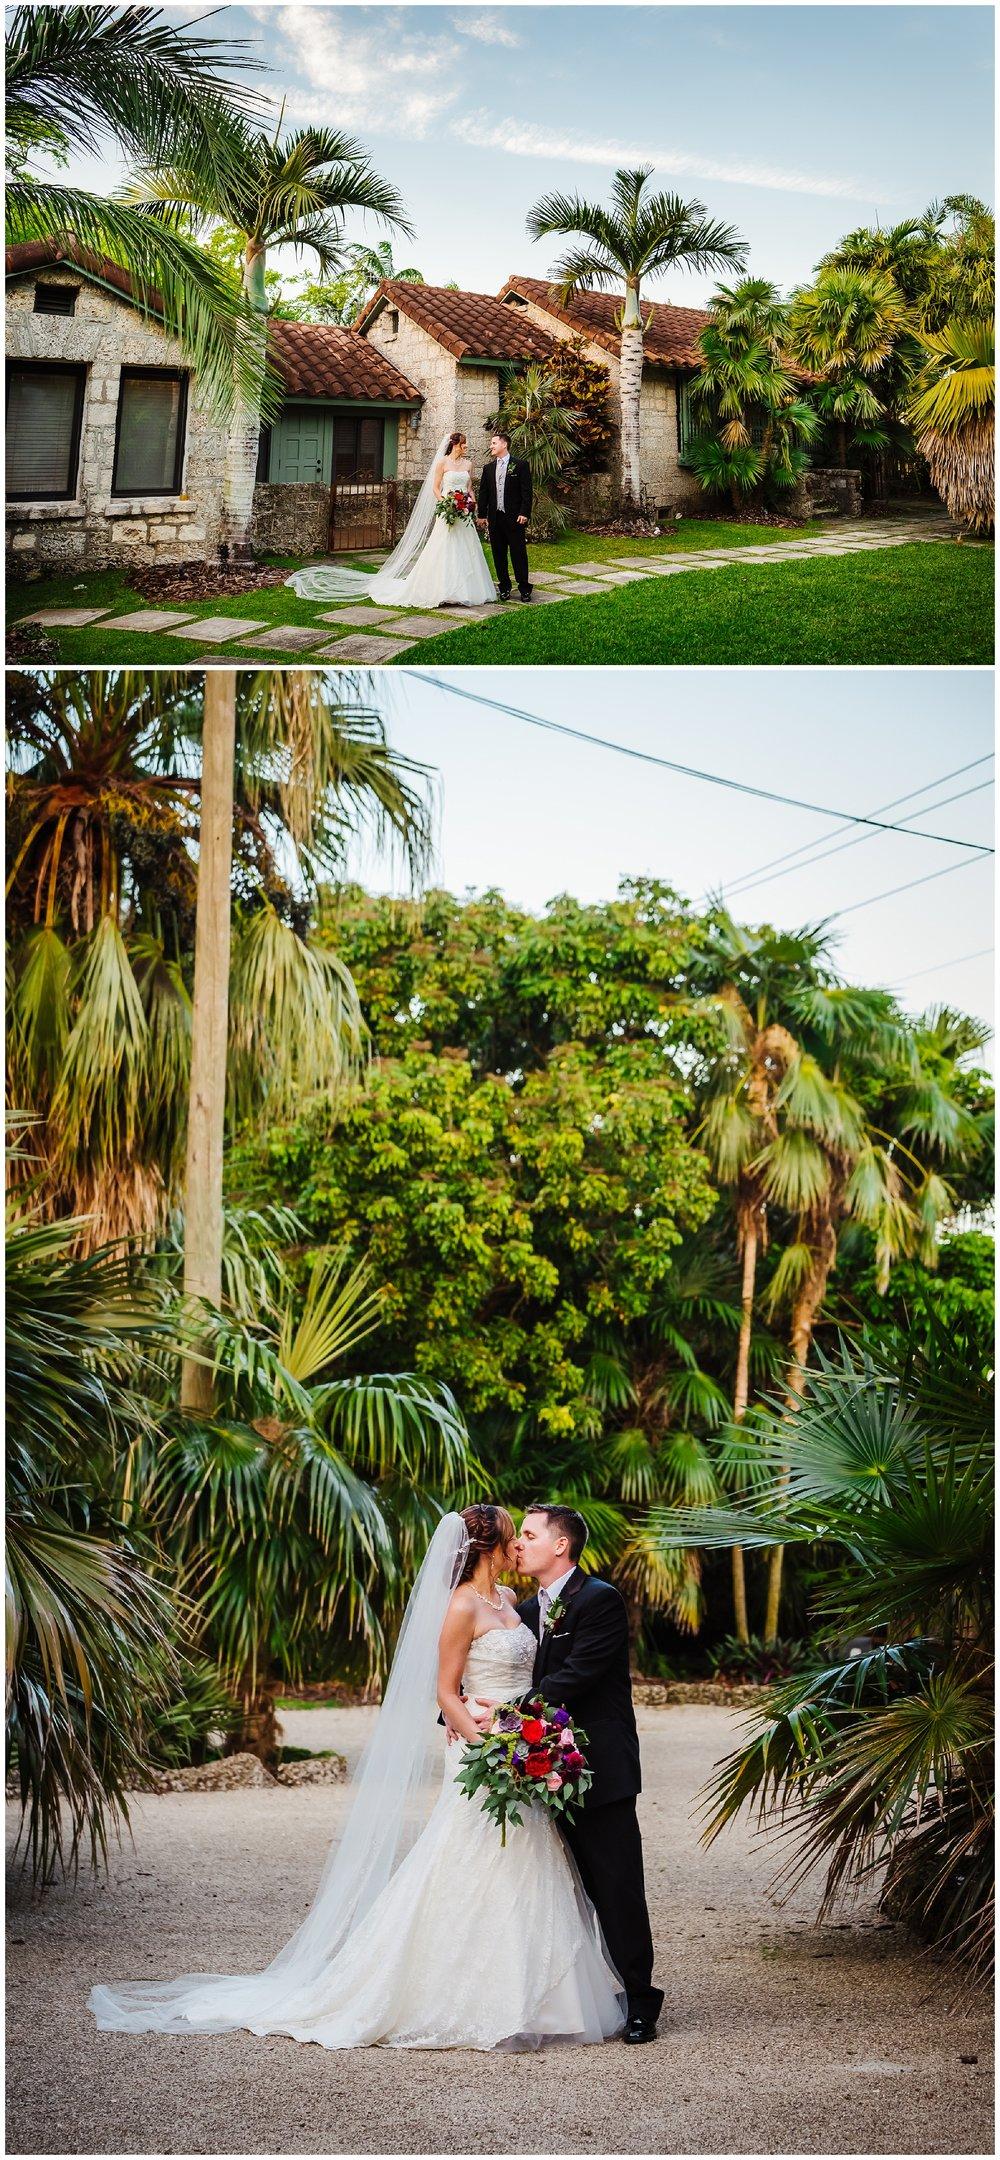 florida-destination-wedding-photographer-enchanted-tropical-miami-homestead-cooper-estate-teal_0061.jpg